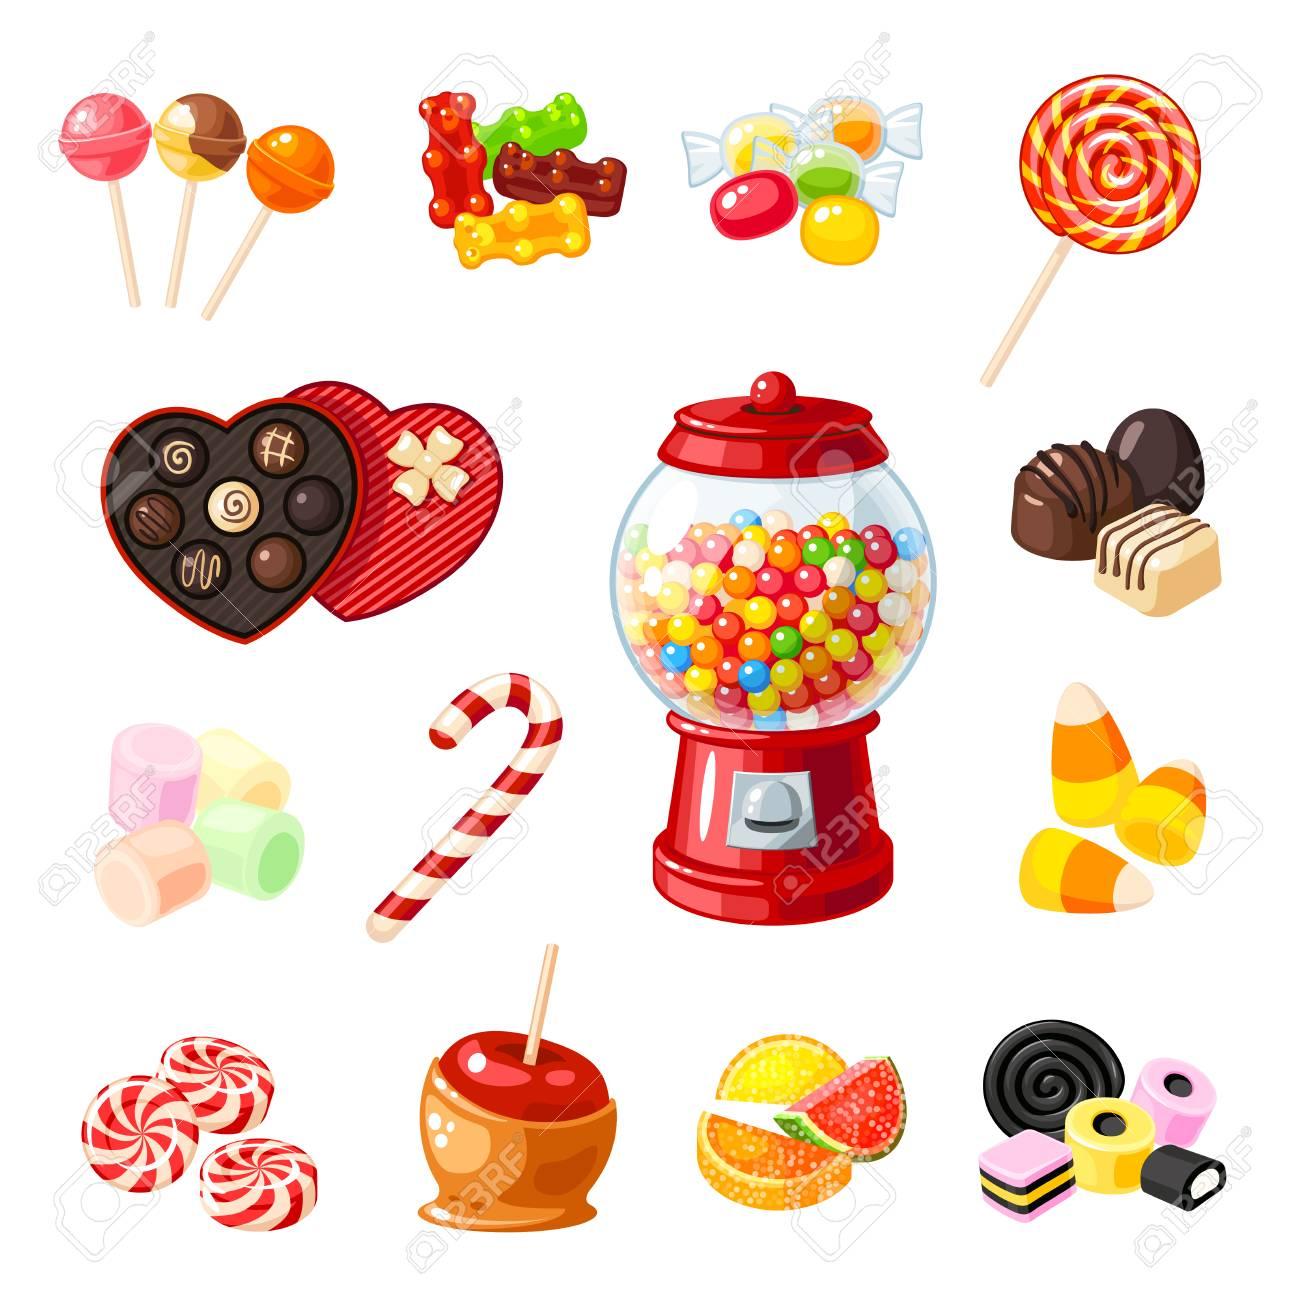 Set Single Cartoon Candies: Lollipop, Candy Cane, Bonbon ...